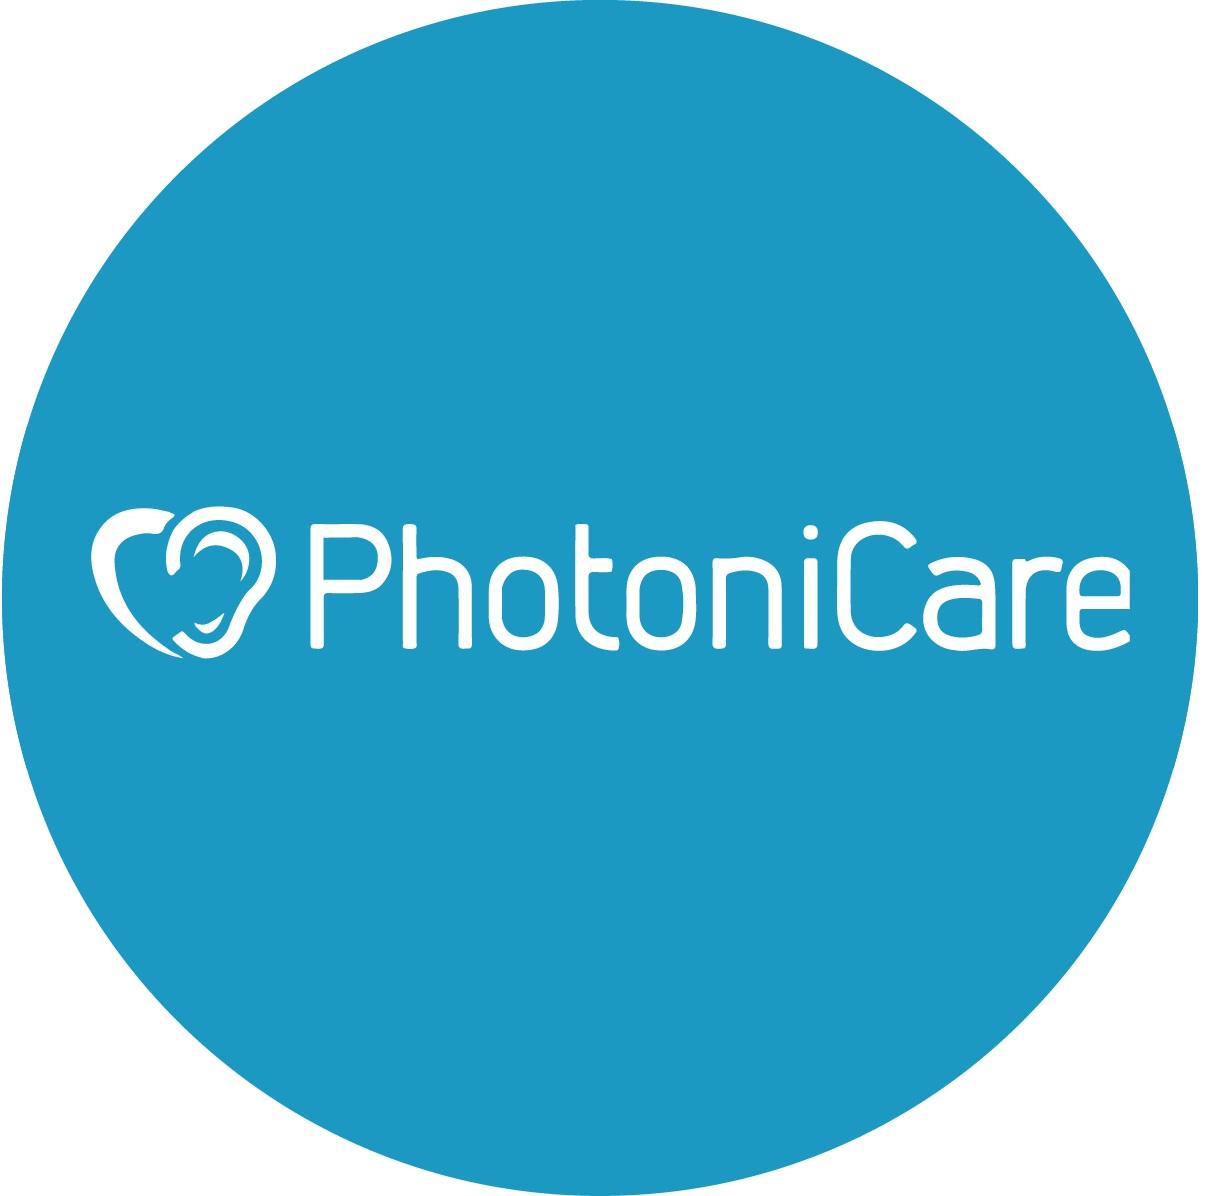 Photonicare.jpg